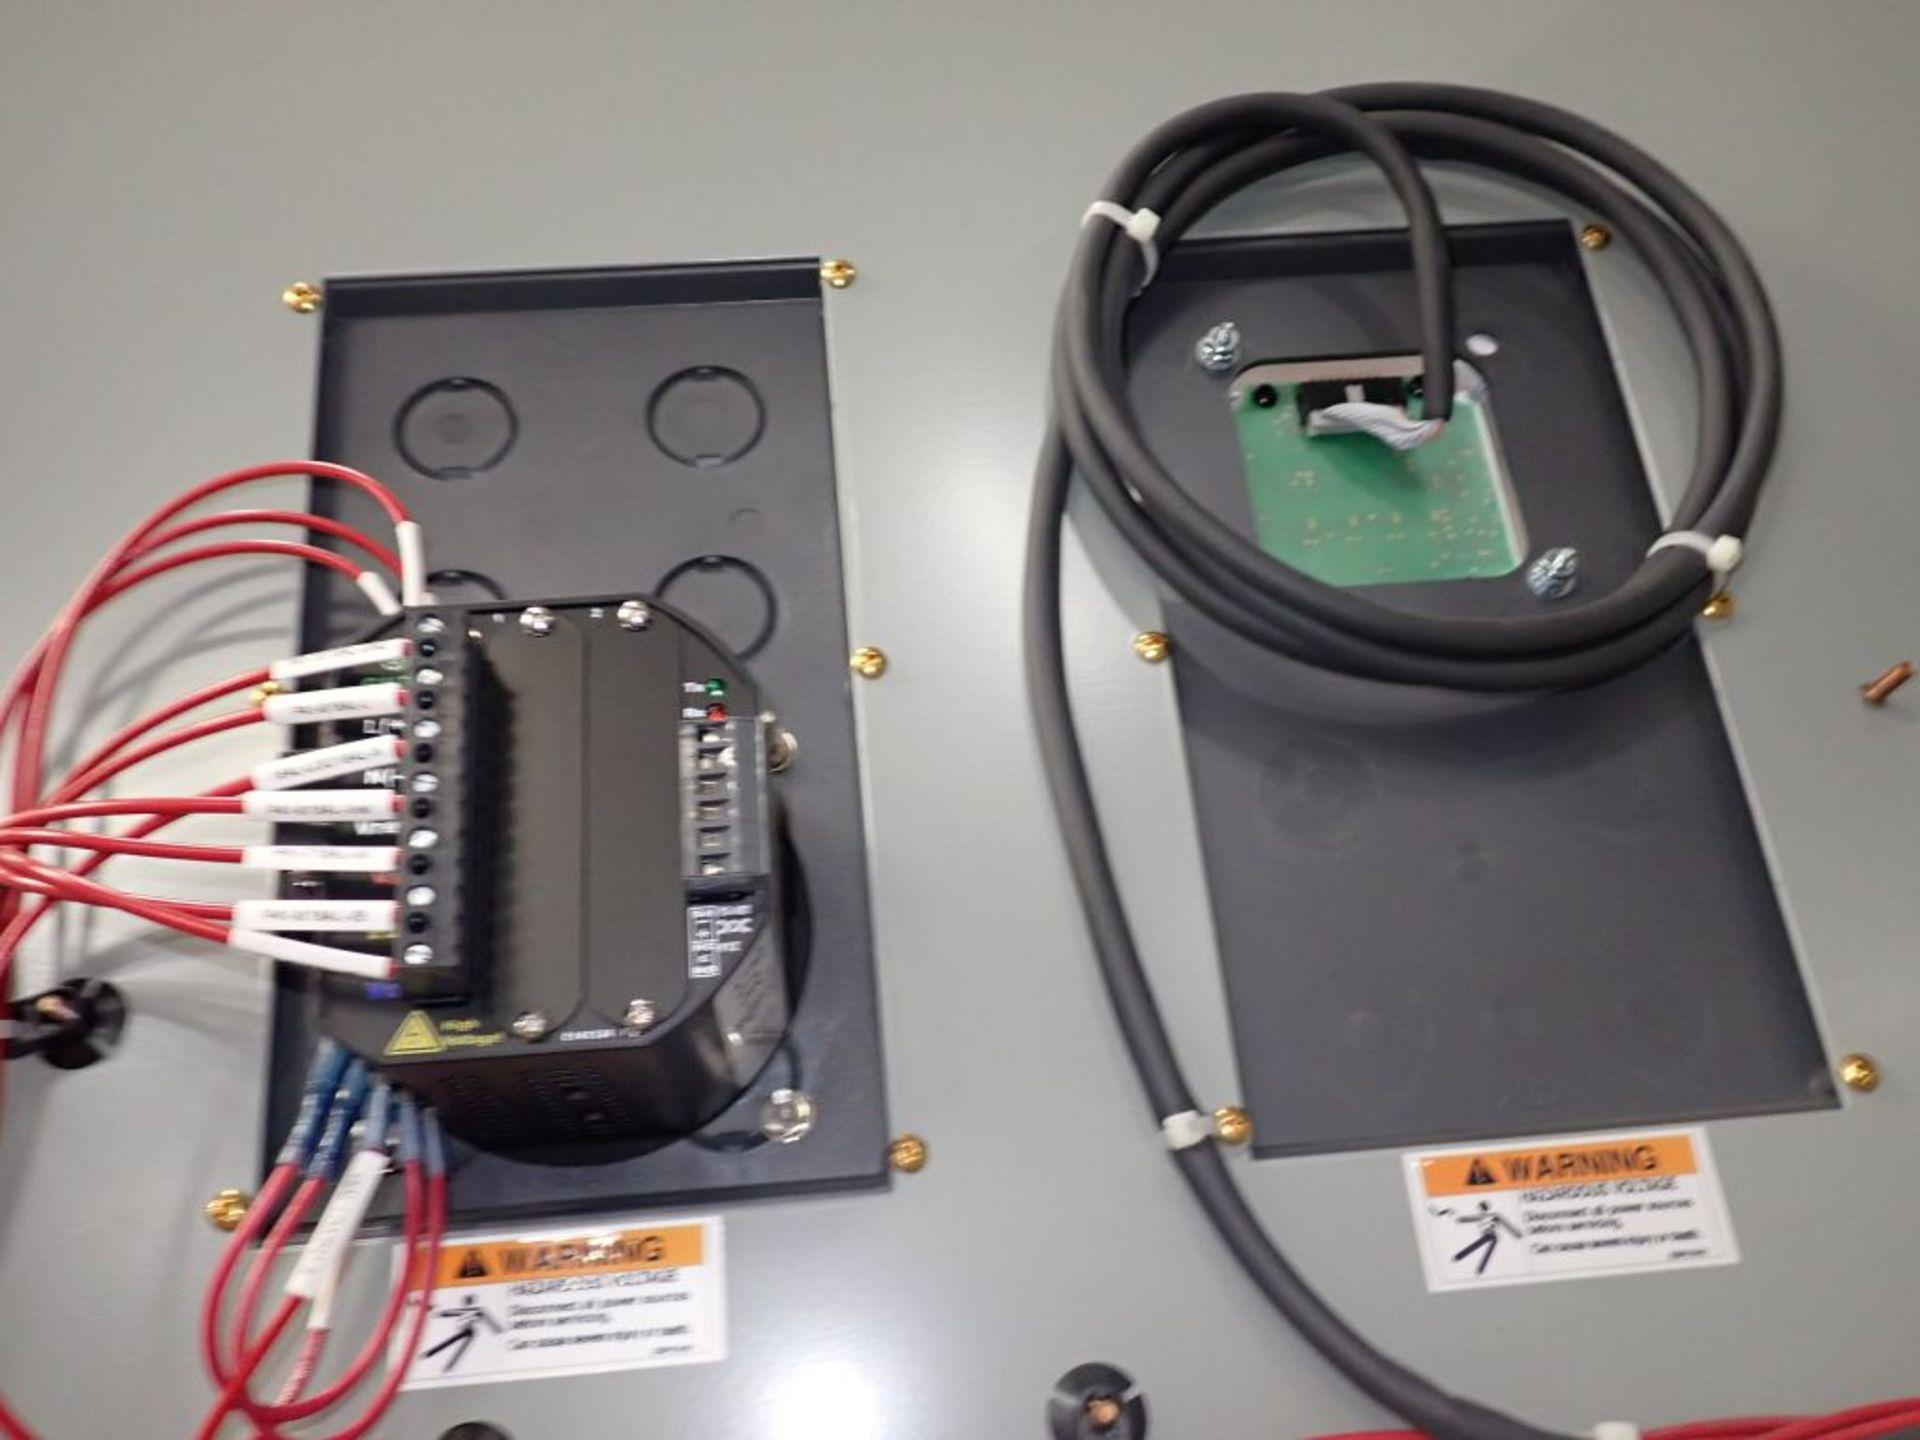 Eaton Transfer Switch | Cat No. ATV9MGB32500XSU; 480V; 3 PH; 2500A; (2) Eaton Magnum DS Circuit - Image 40 of 50